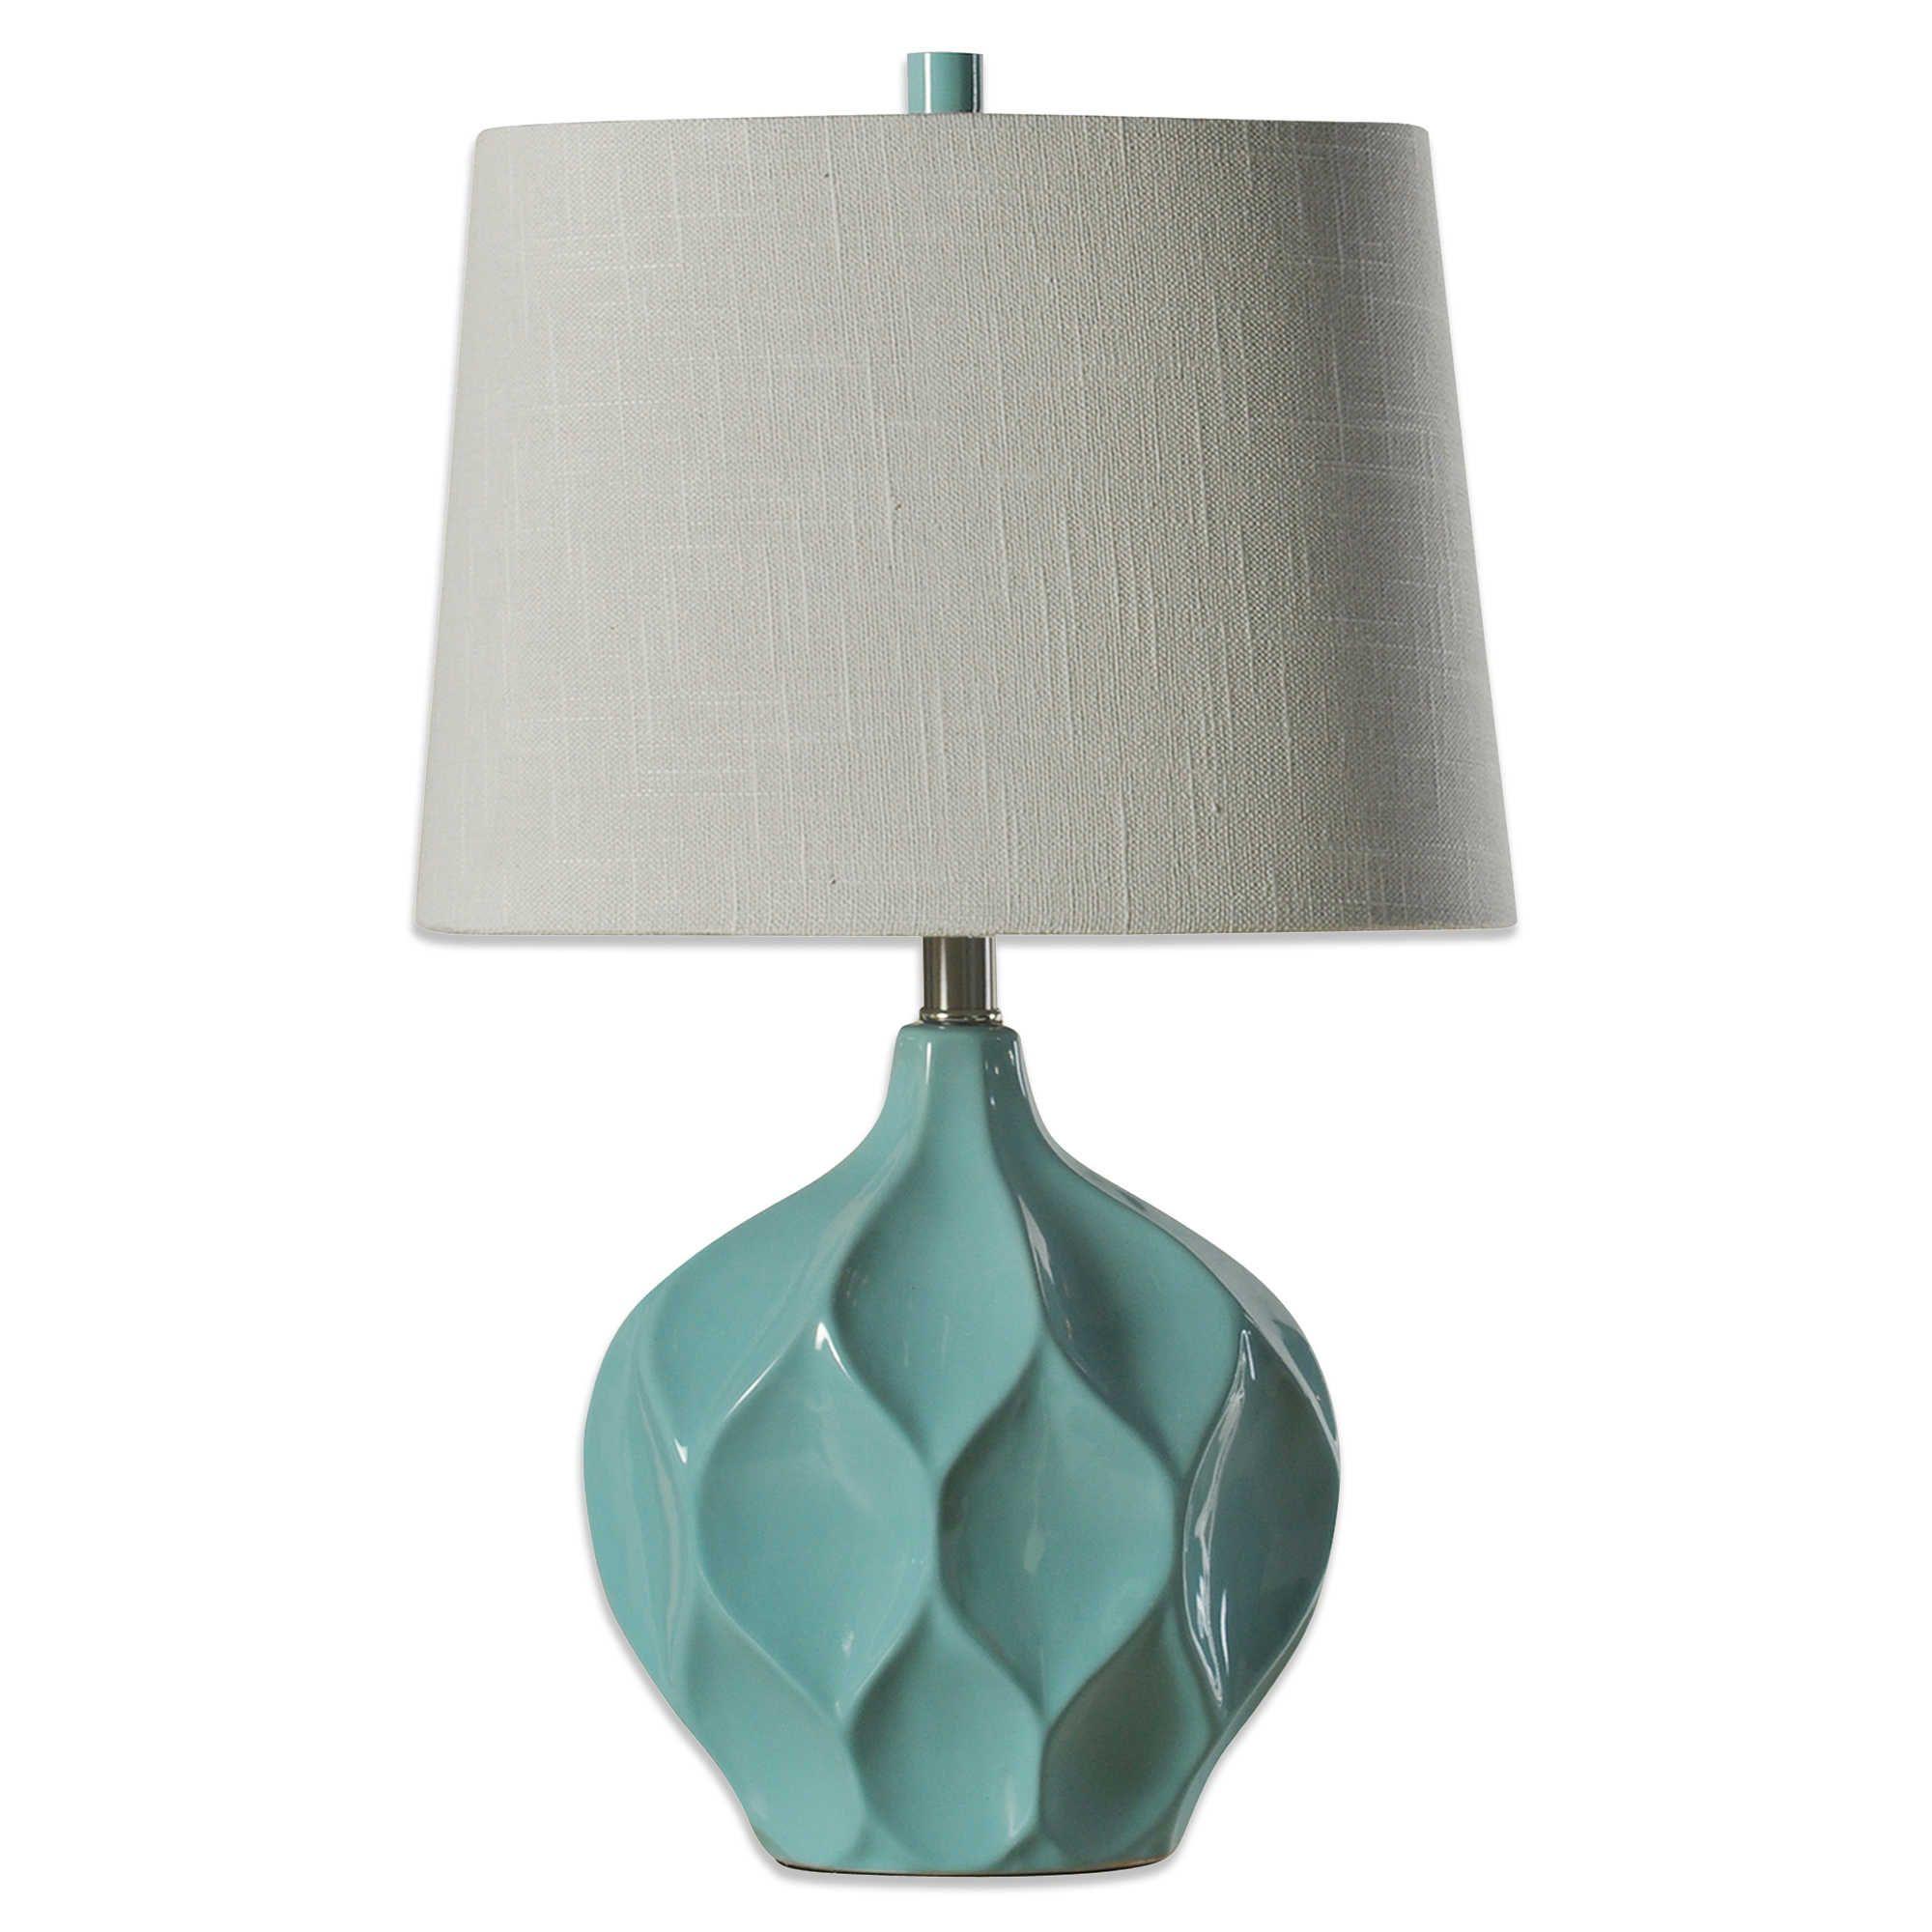 Invalid Url Table Lamp Lamp Ceramic Table Lamps